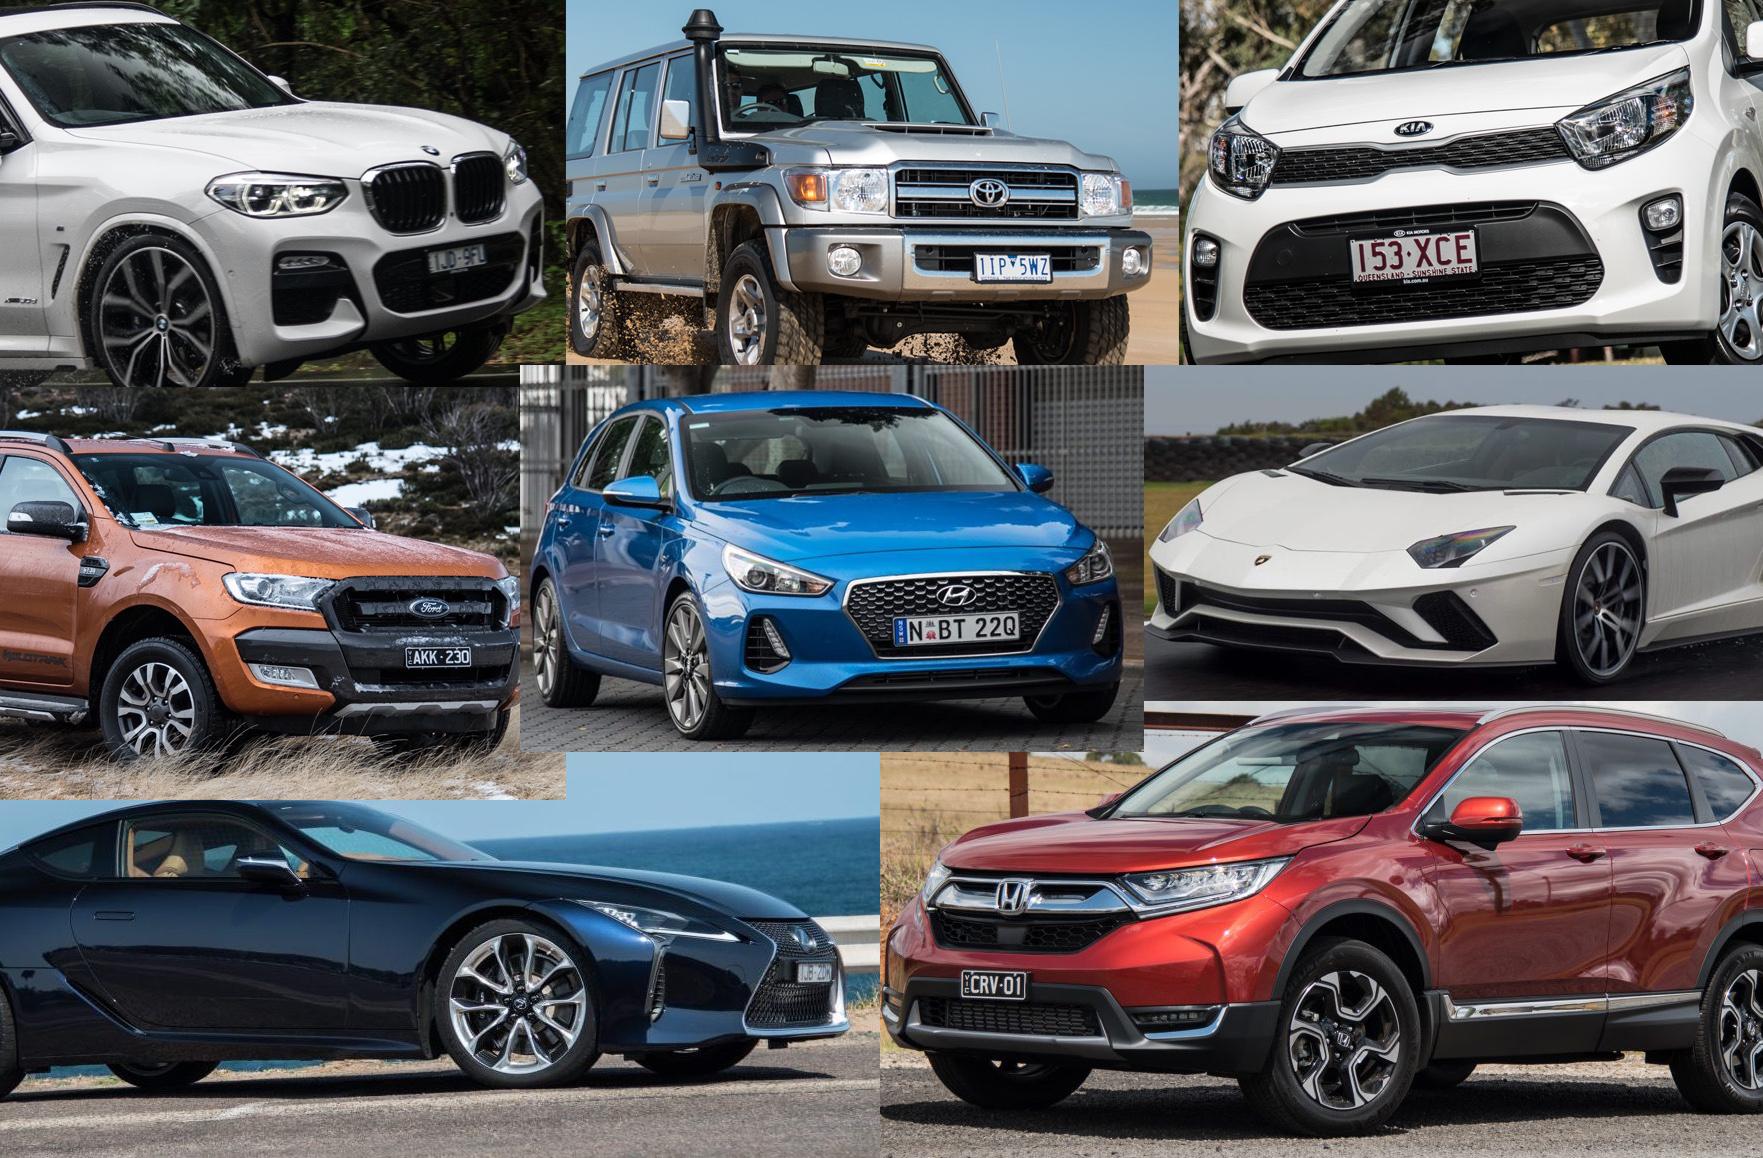 PerformanceDrive's top 10 best new cars of 2017